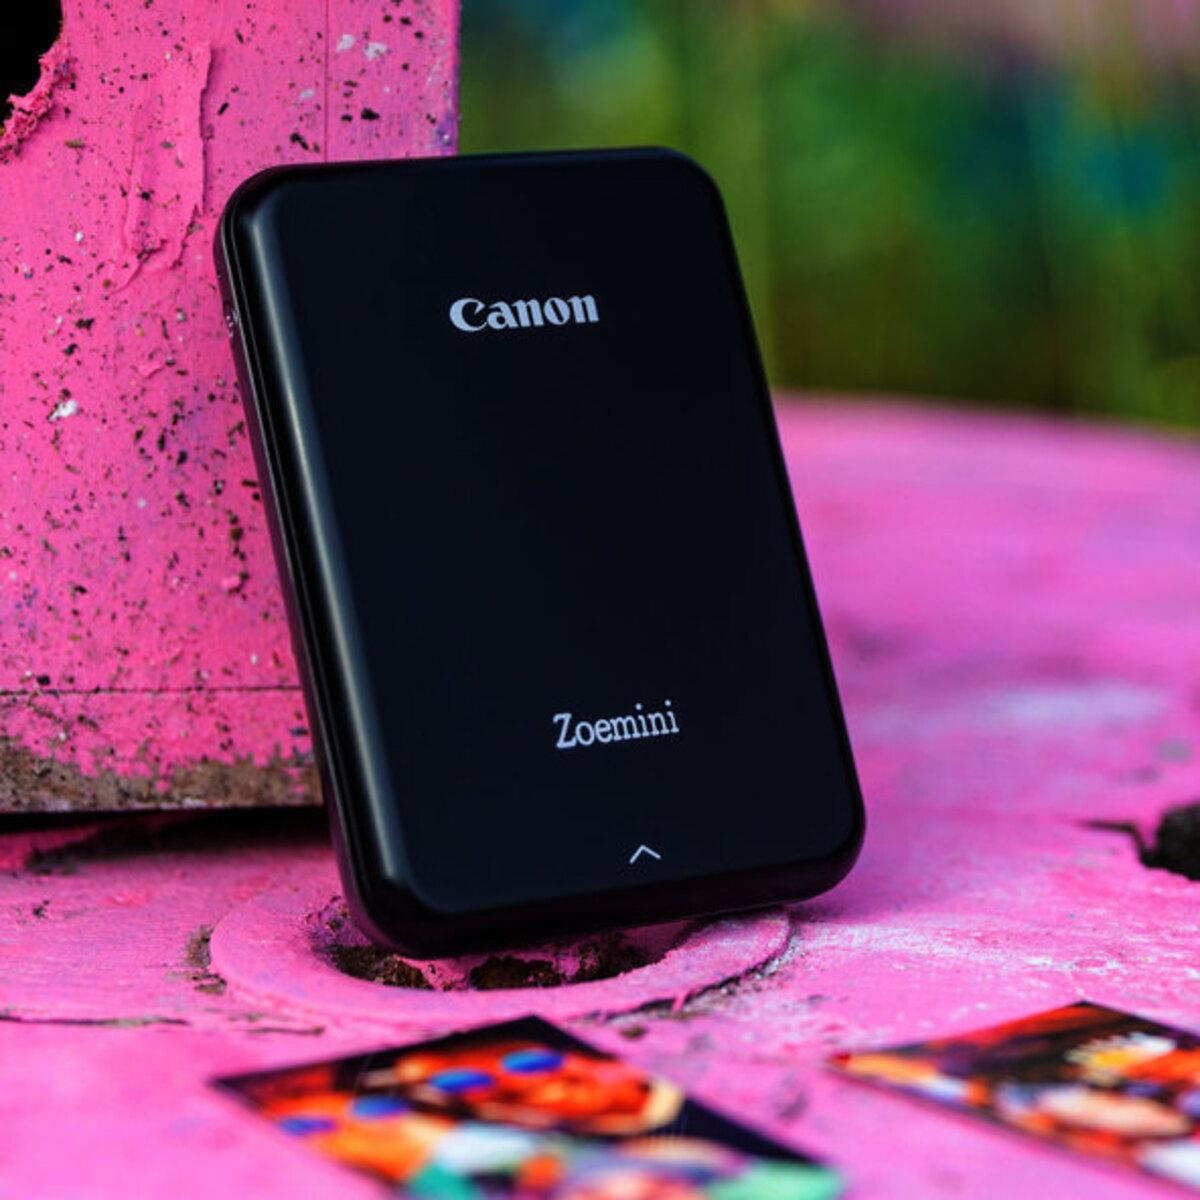 Bild 4 von Mini-Fotodrucker Canon Zoemini, schwarz